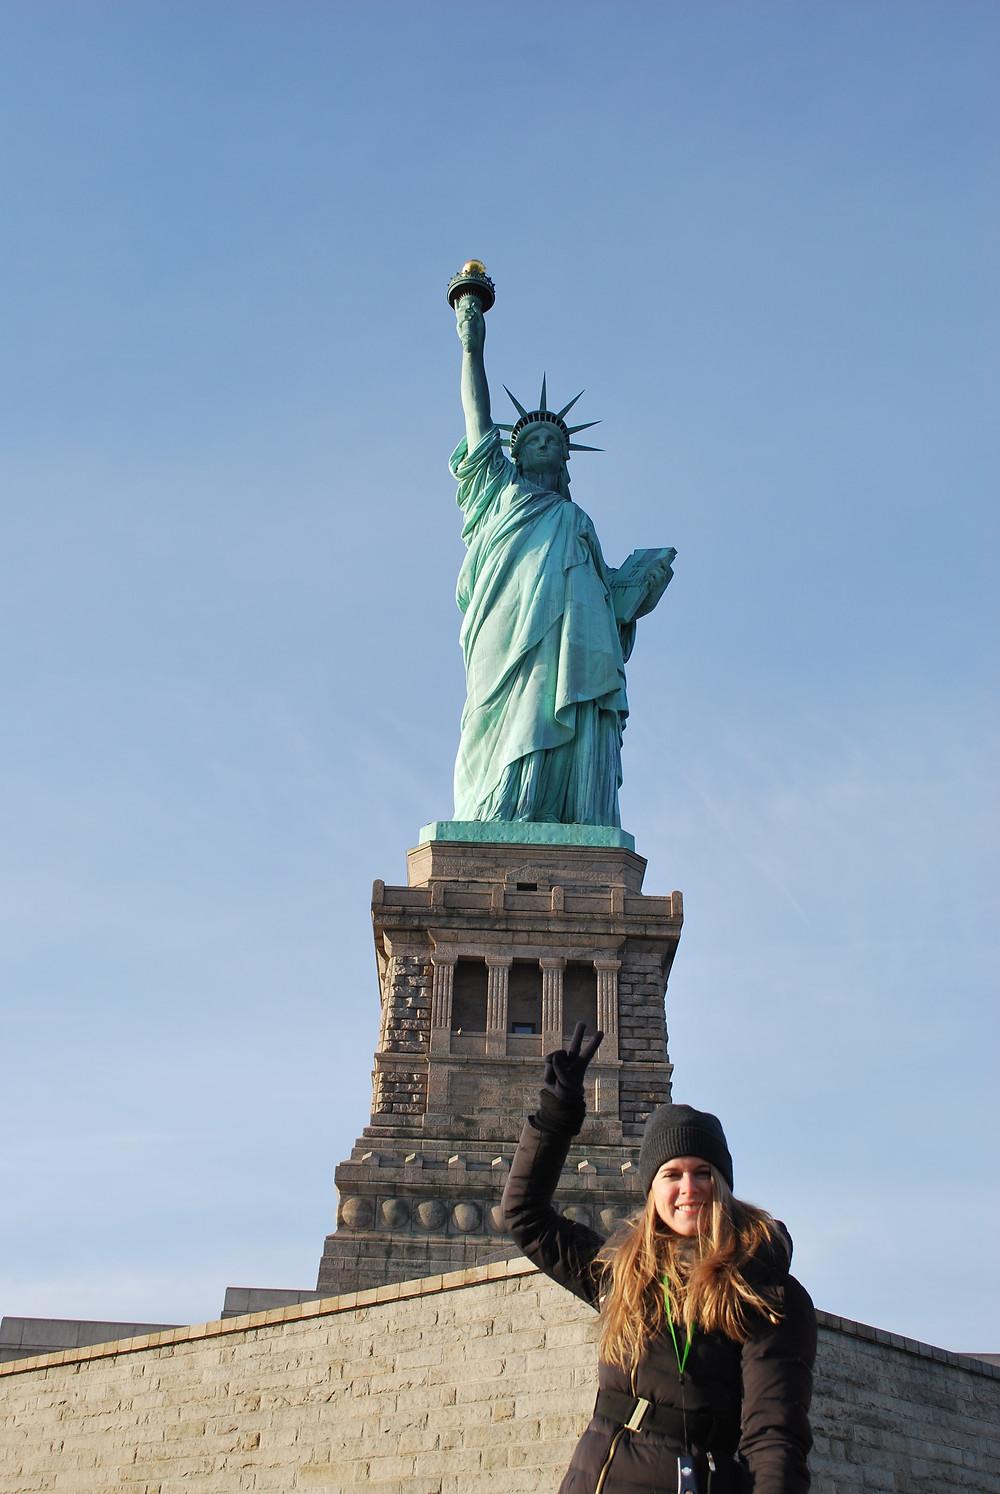 Statue of Liberty, Liberty Island, New York